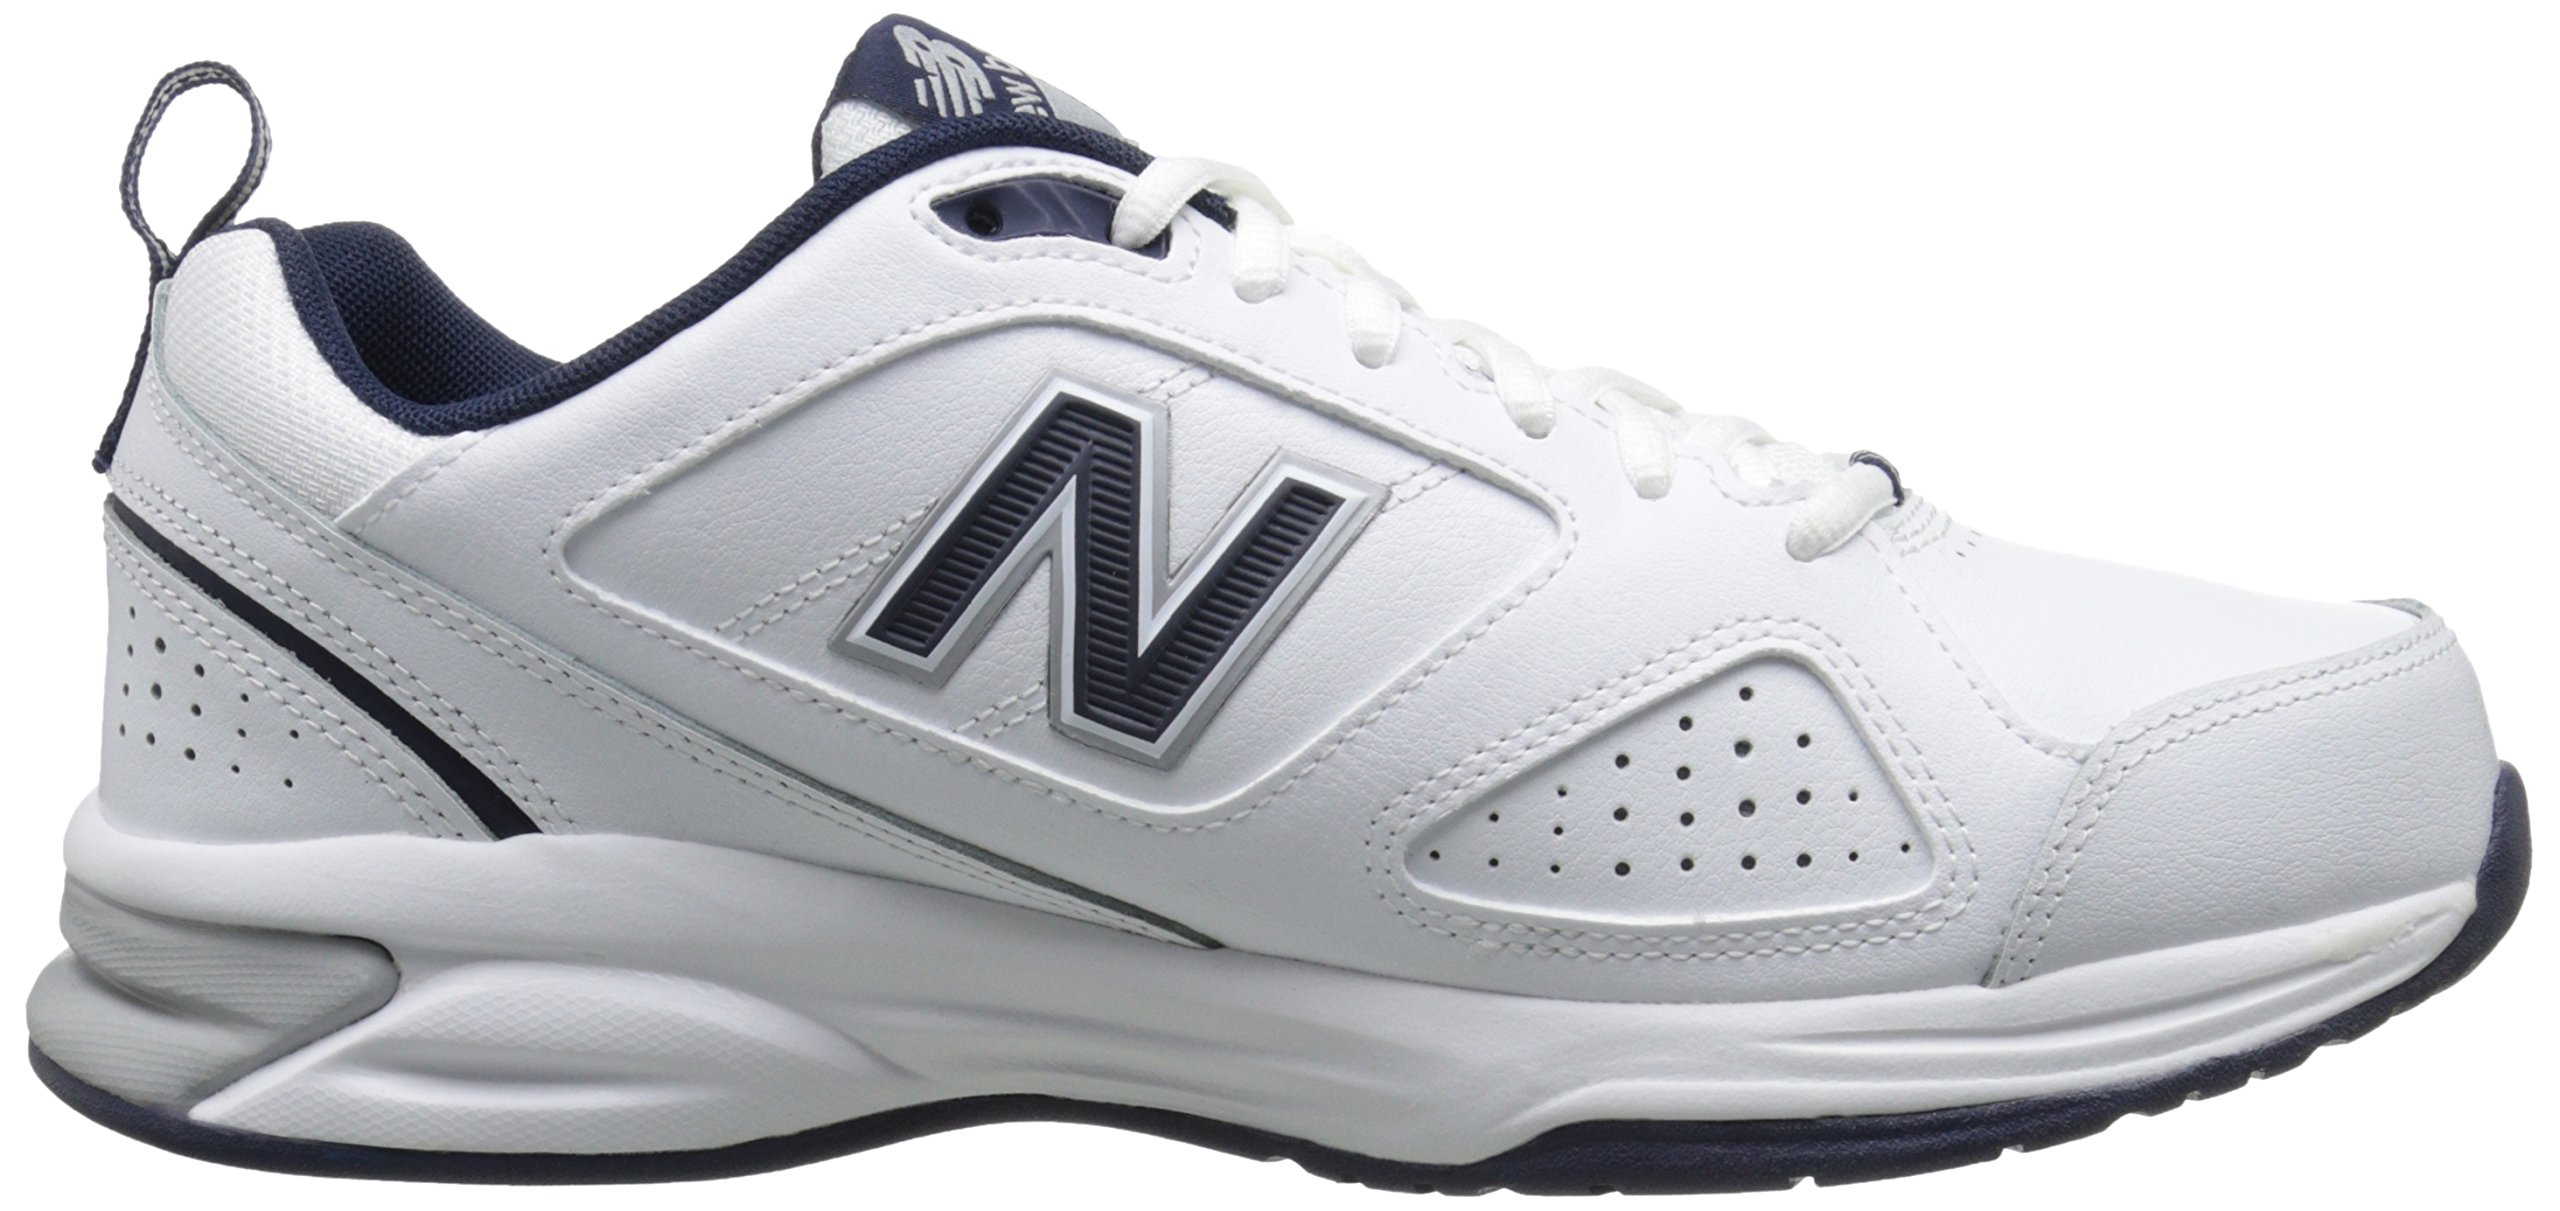 New Balance Men's MX623v3 Casual Comfort Training Shoe,  White/Navy, 8 M US by New Balance (Image #7)